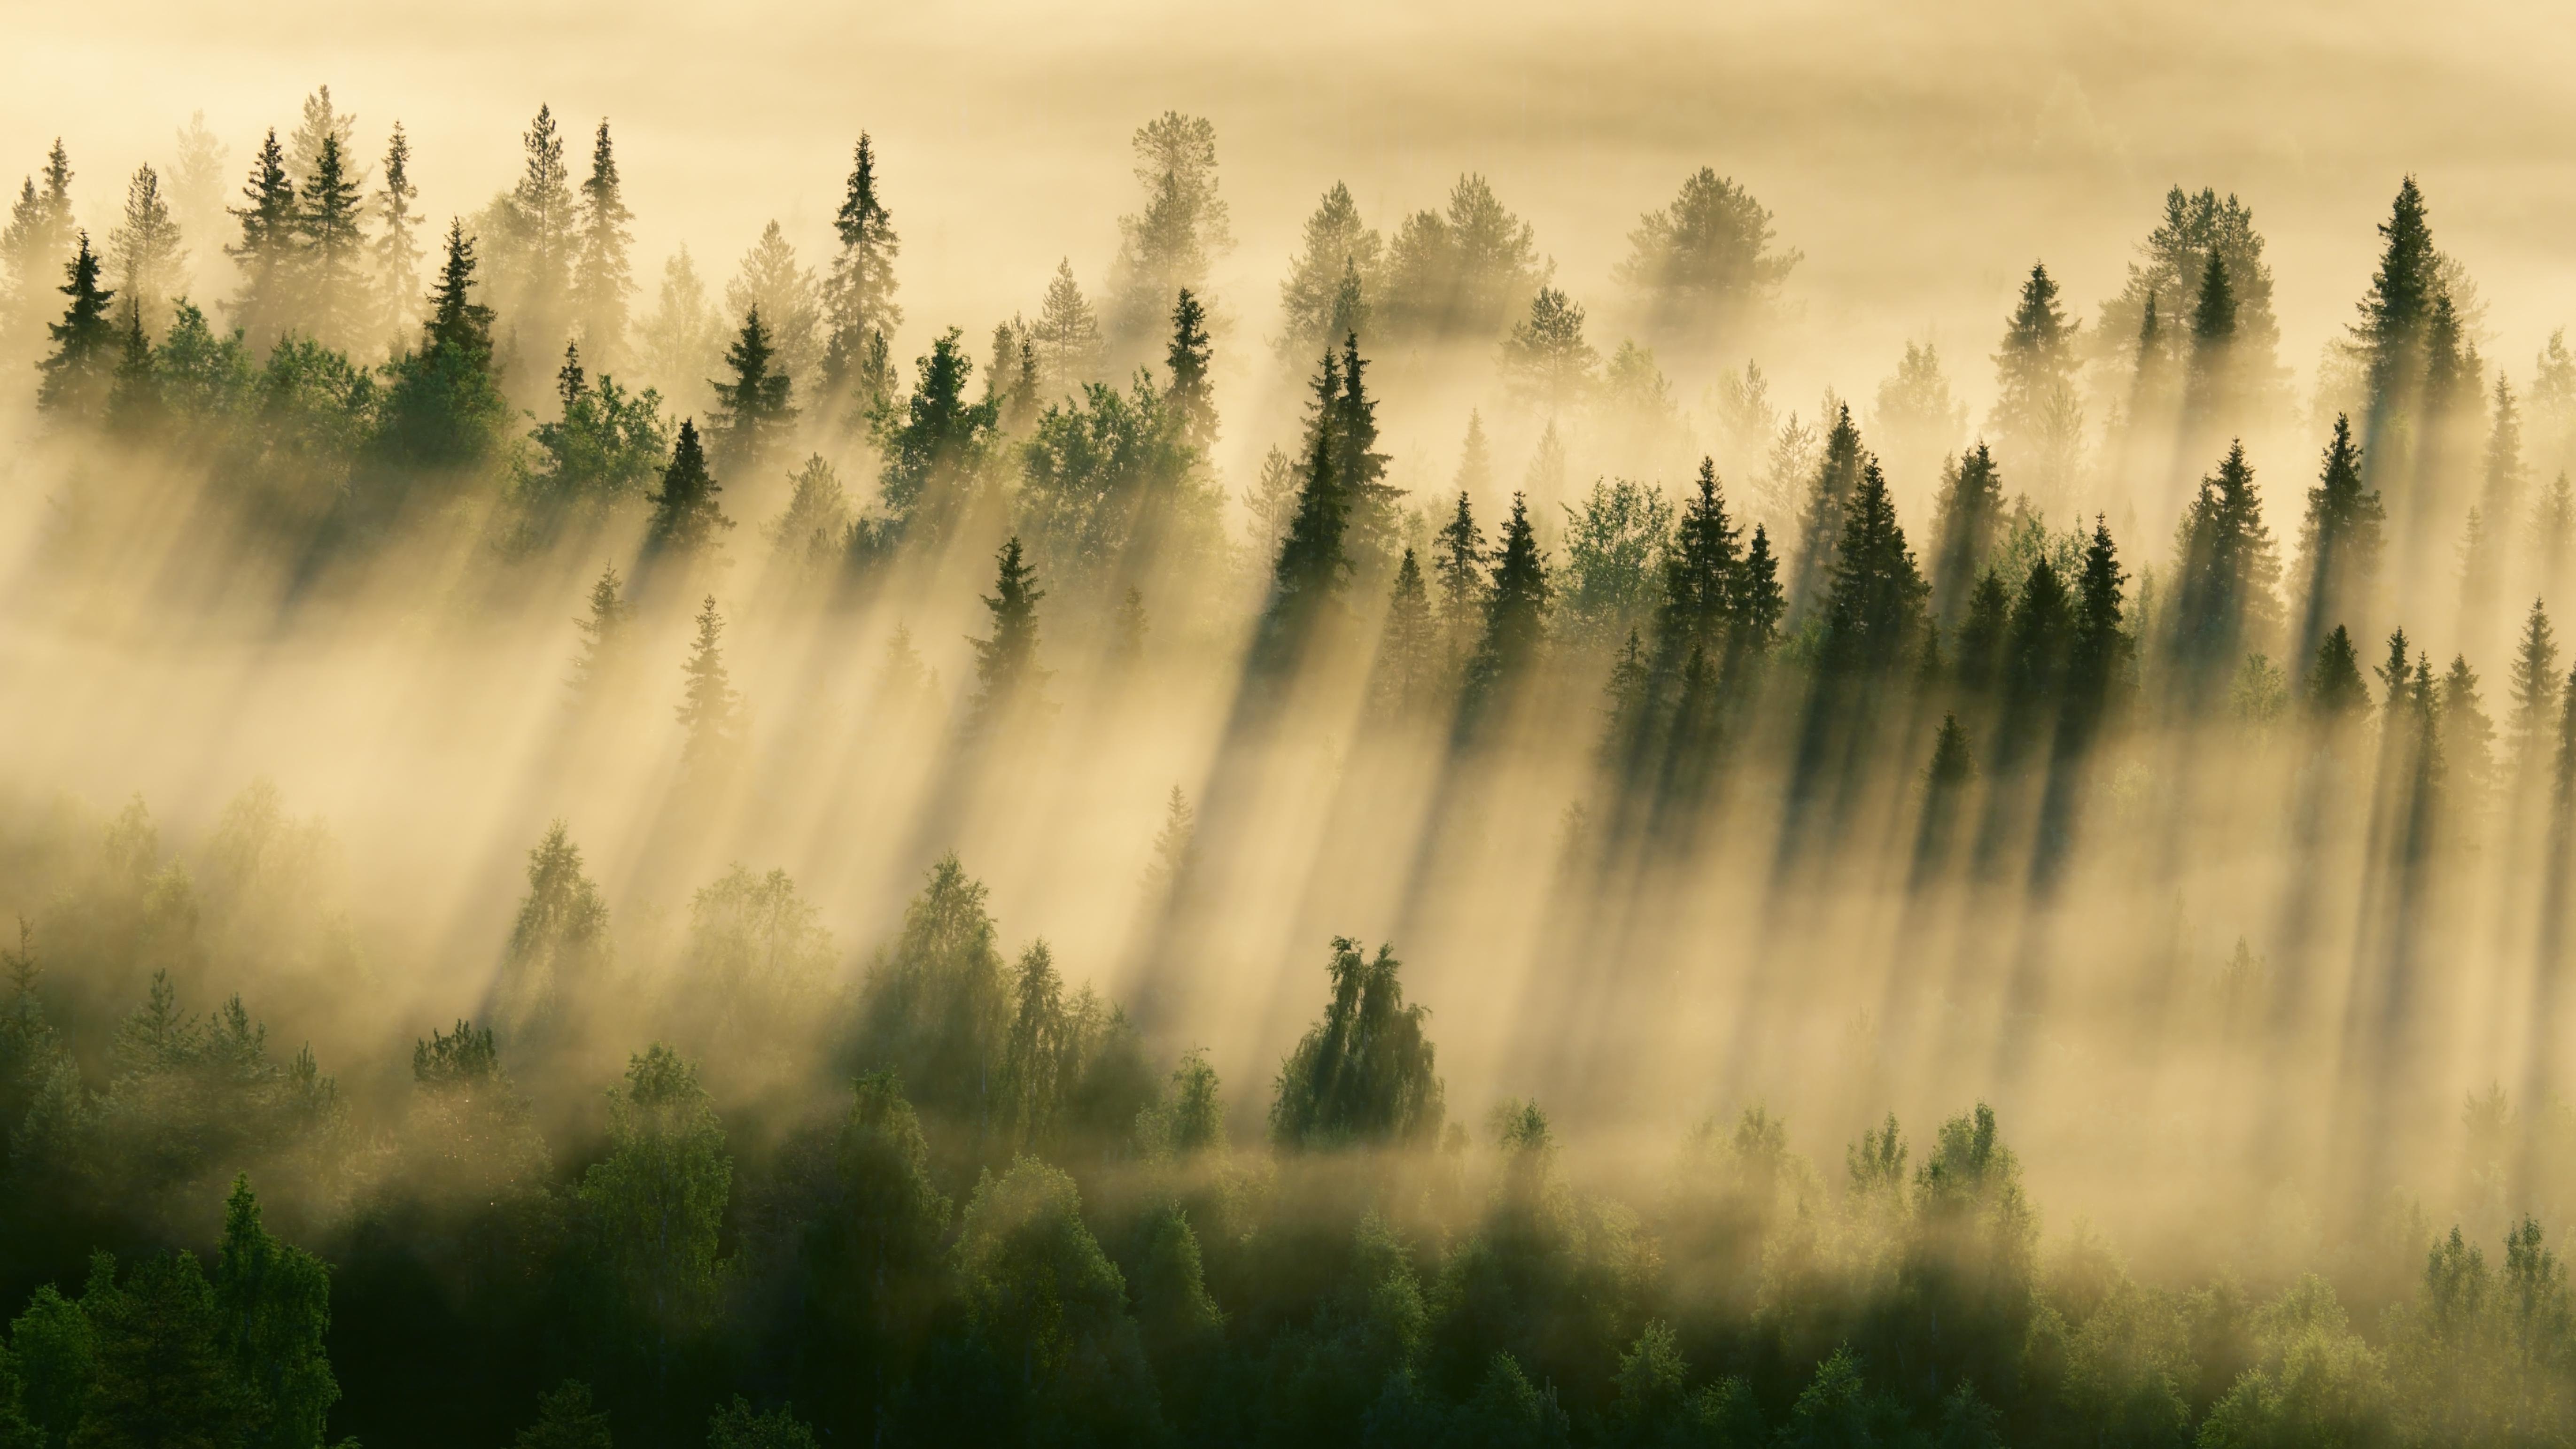 Туман в лесу обои на рабочий стол